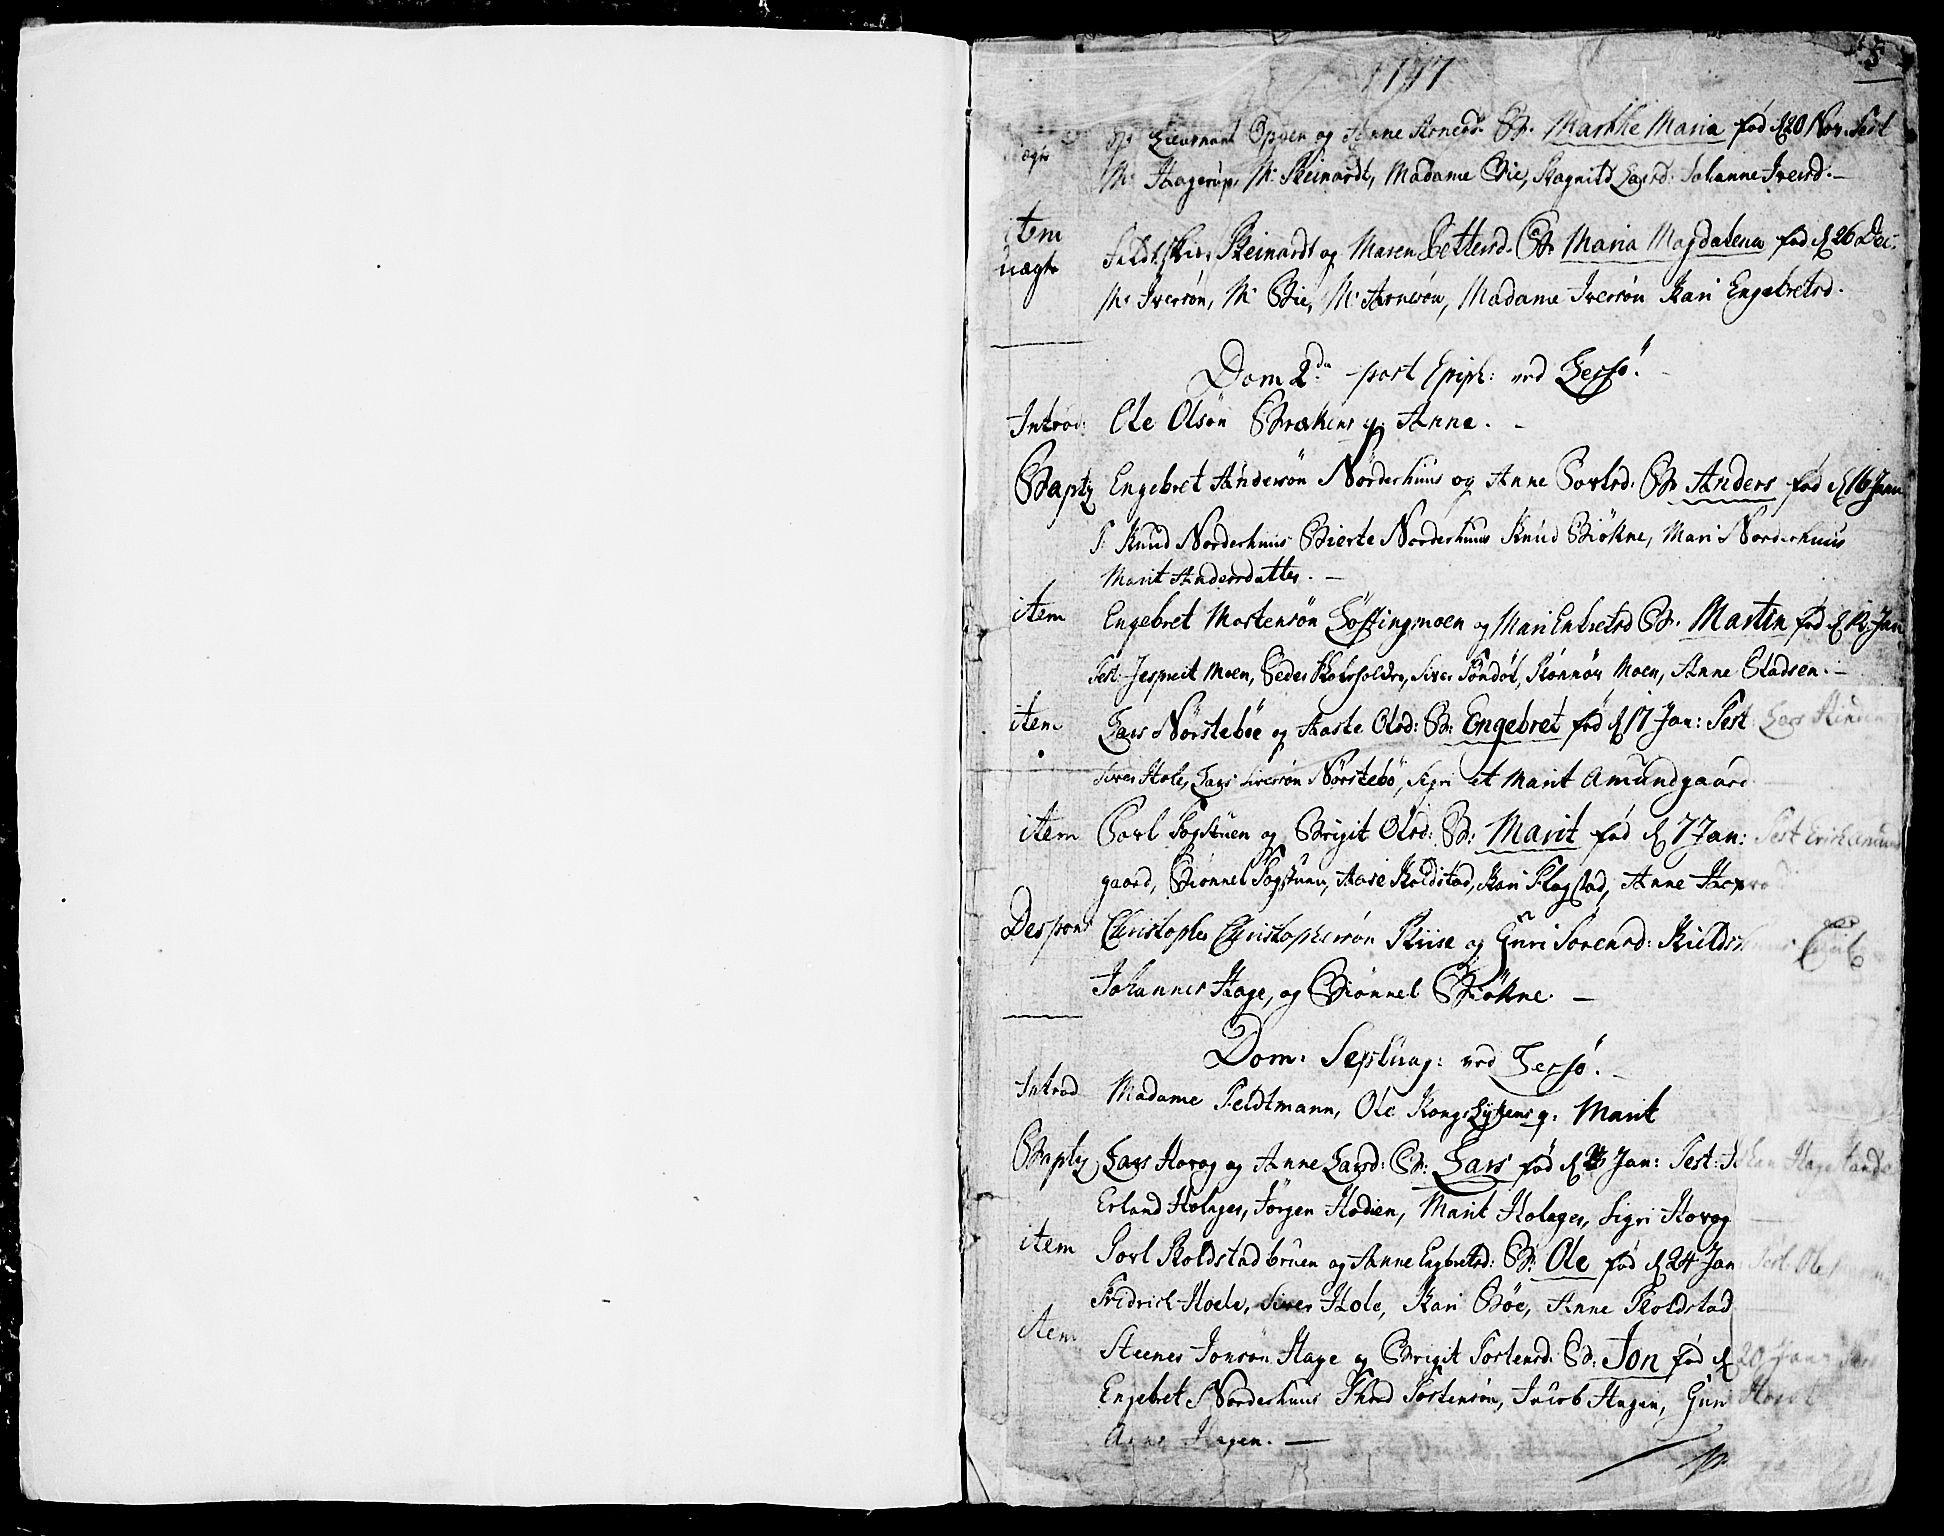 SAH, Lesja prestekontor, Ministerialbok nr. 3, 1777-1819, s. 4-5